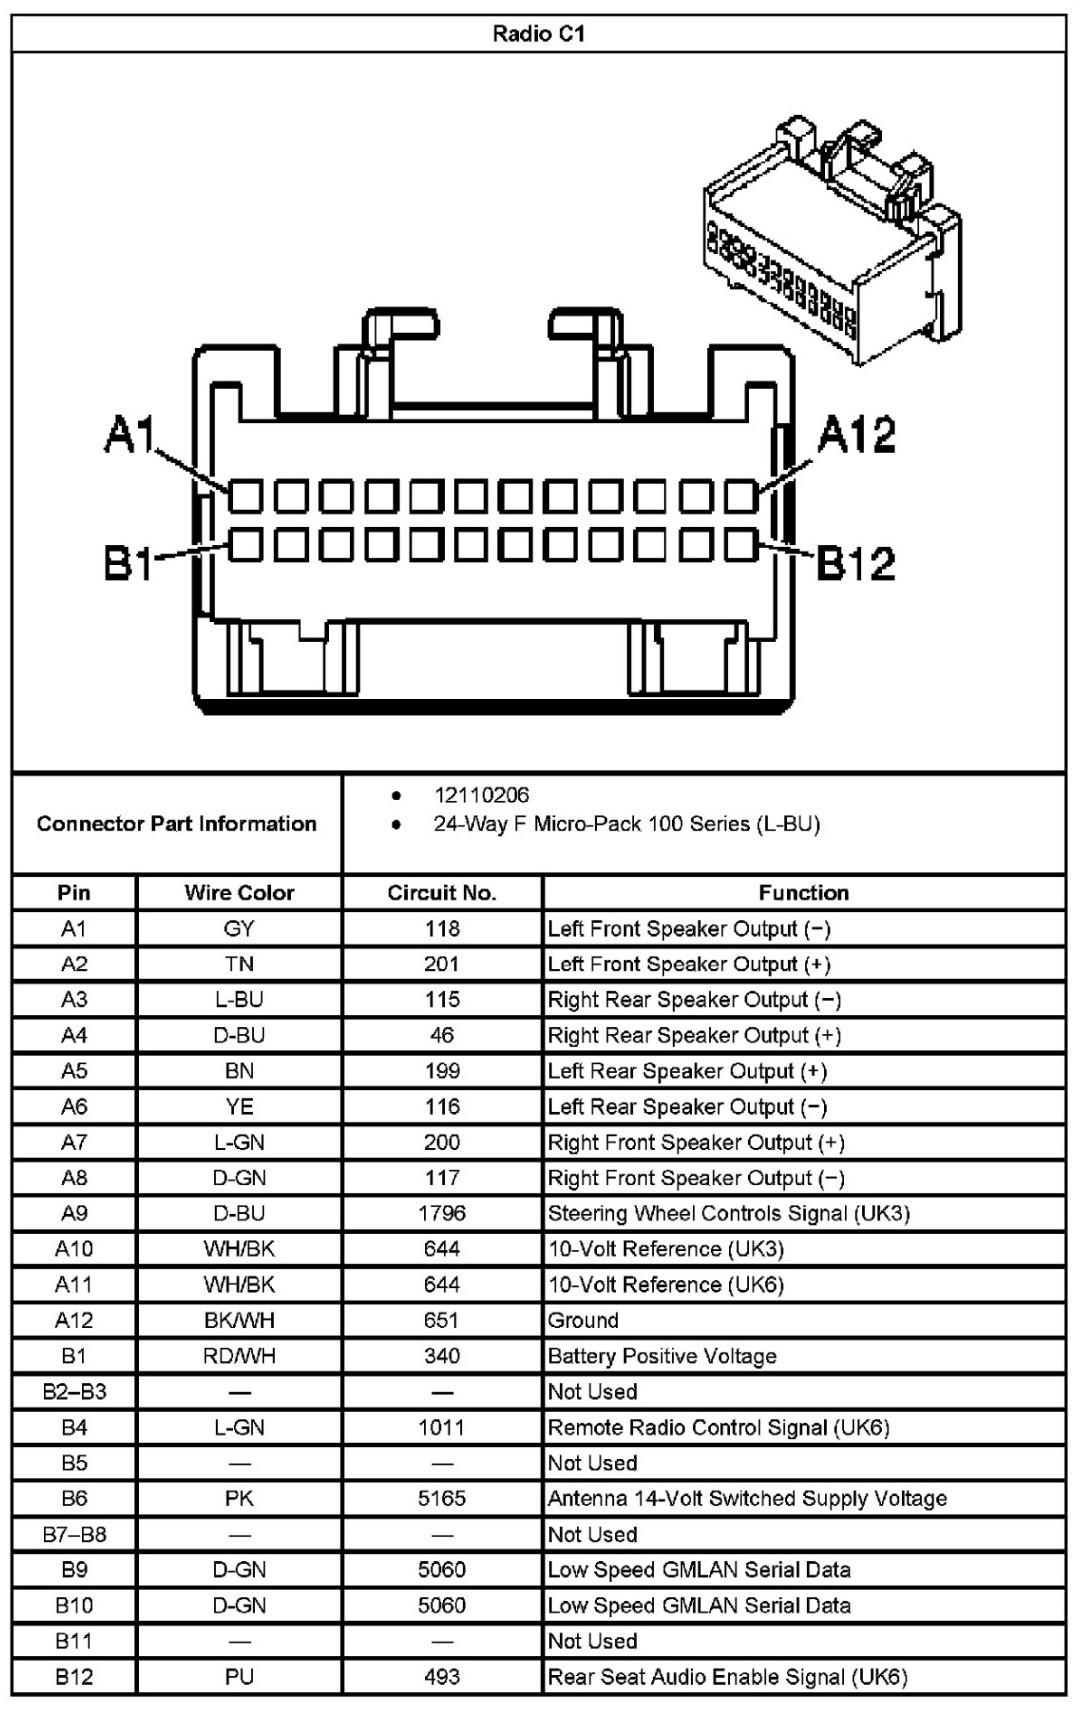 Ready Remote Wiring Diagram Wiring Diagram On 2001 Chevy Malibu Door Panel Diagram Wiring Pos